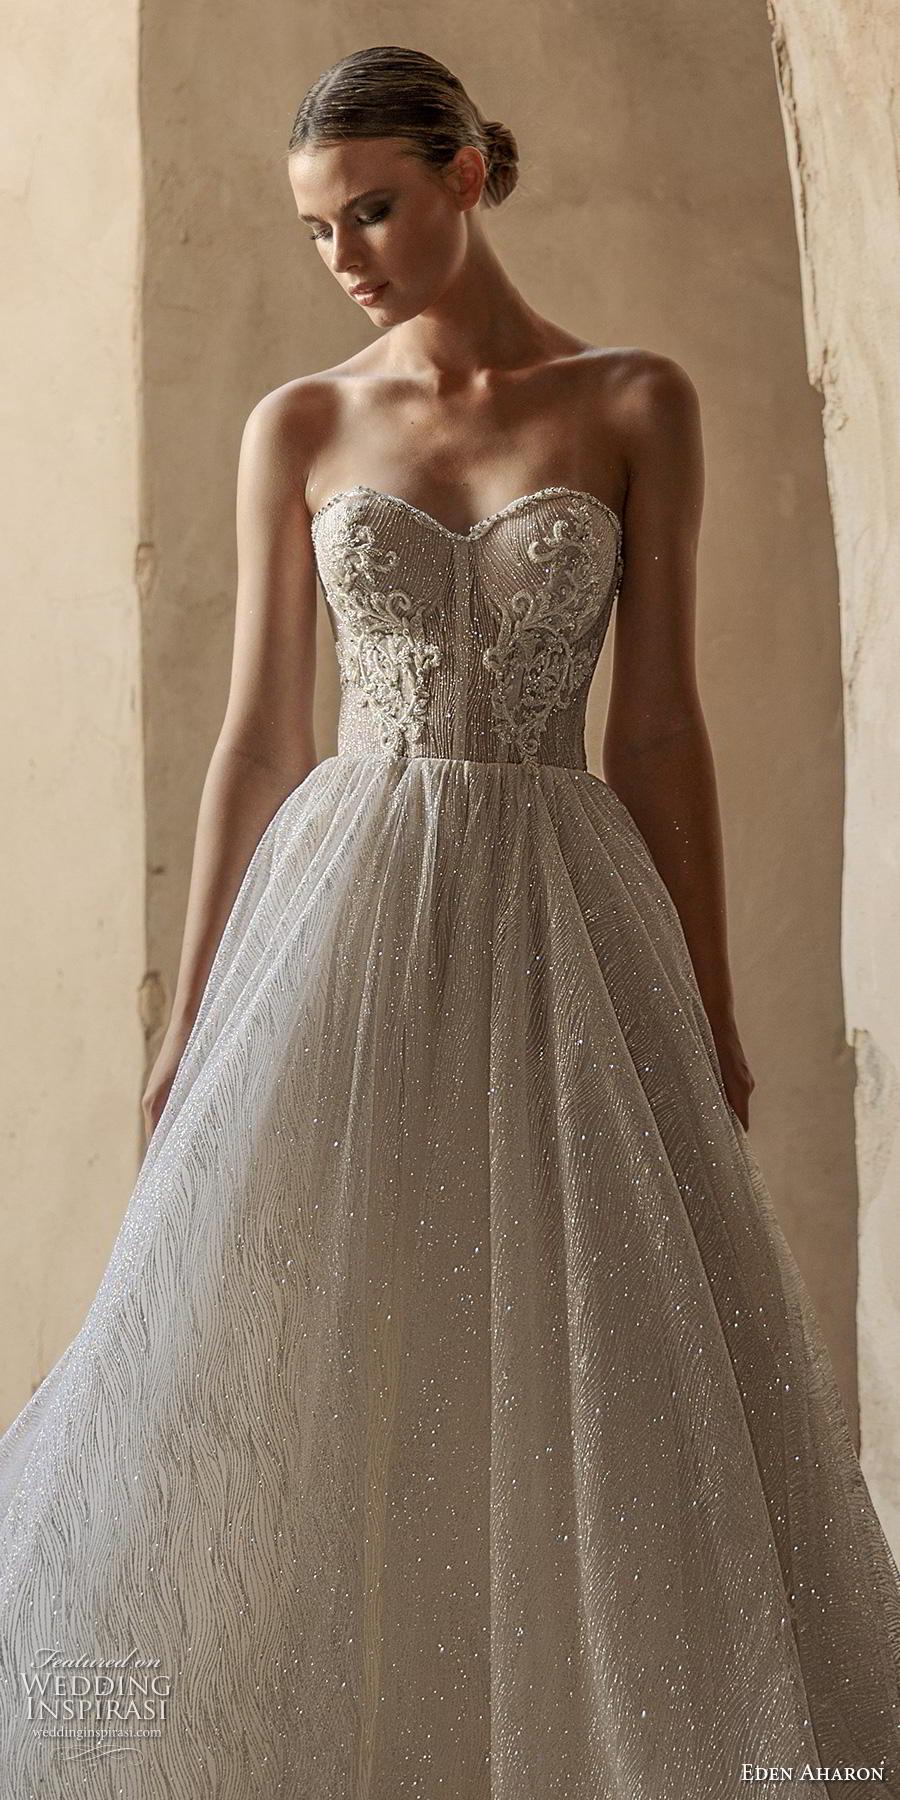 eden aharon 2019 bridal strapless sweetheart neckline heavily embellished bodice glitzy romantic a  line wedding dress mid back sweep train (8) lv